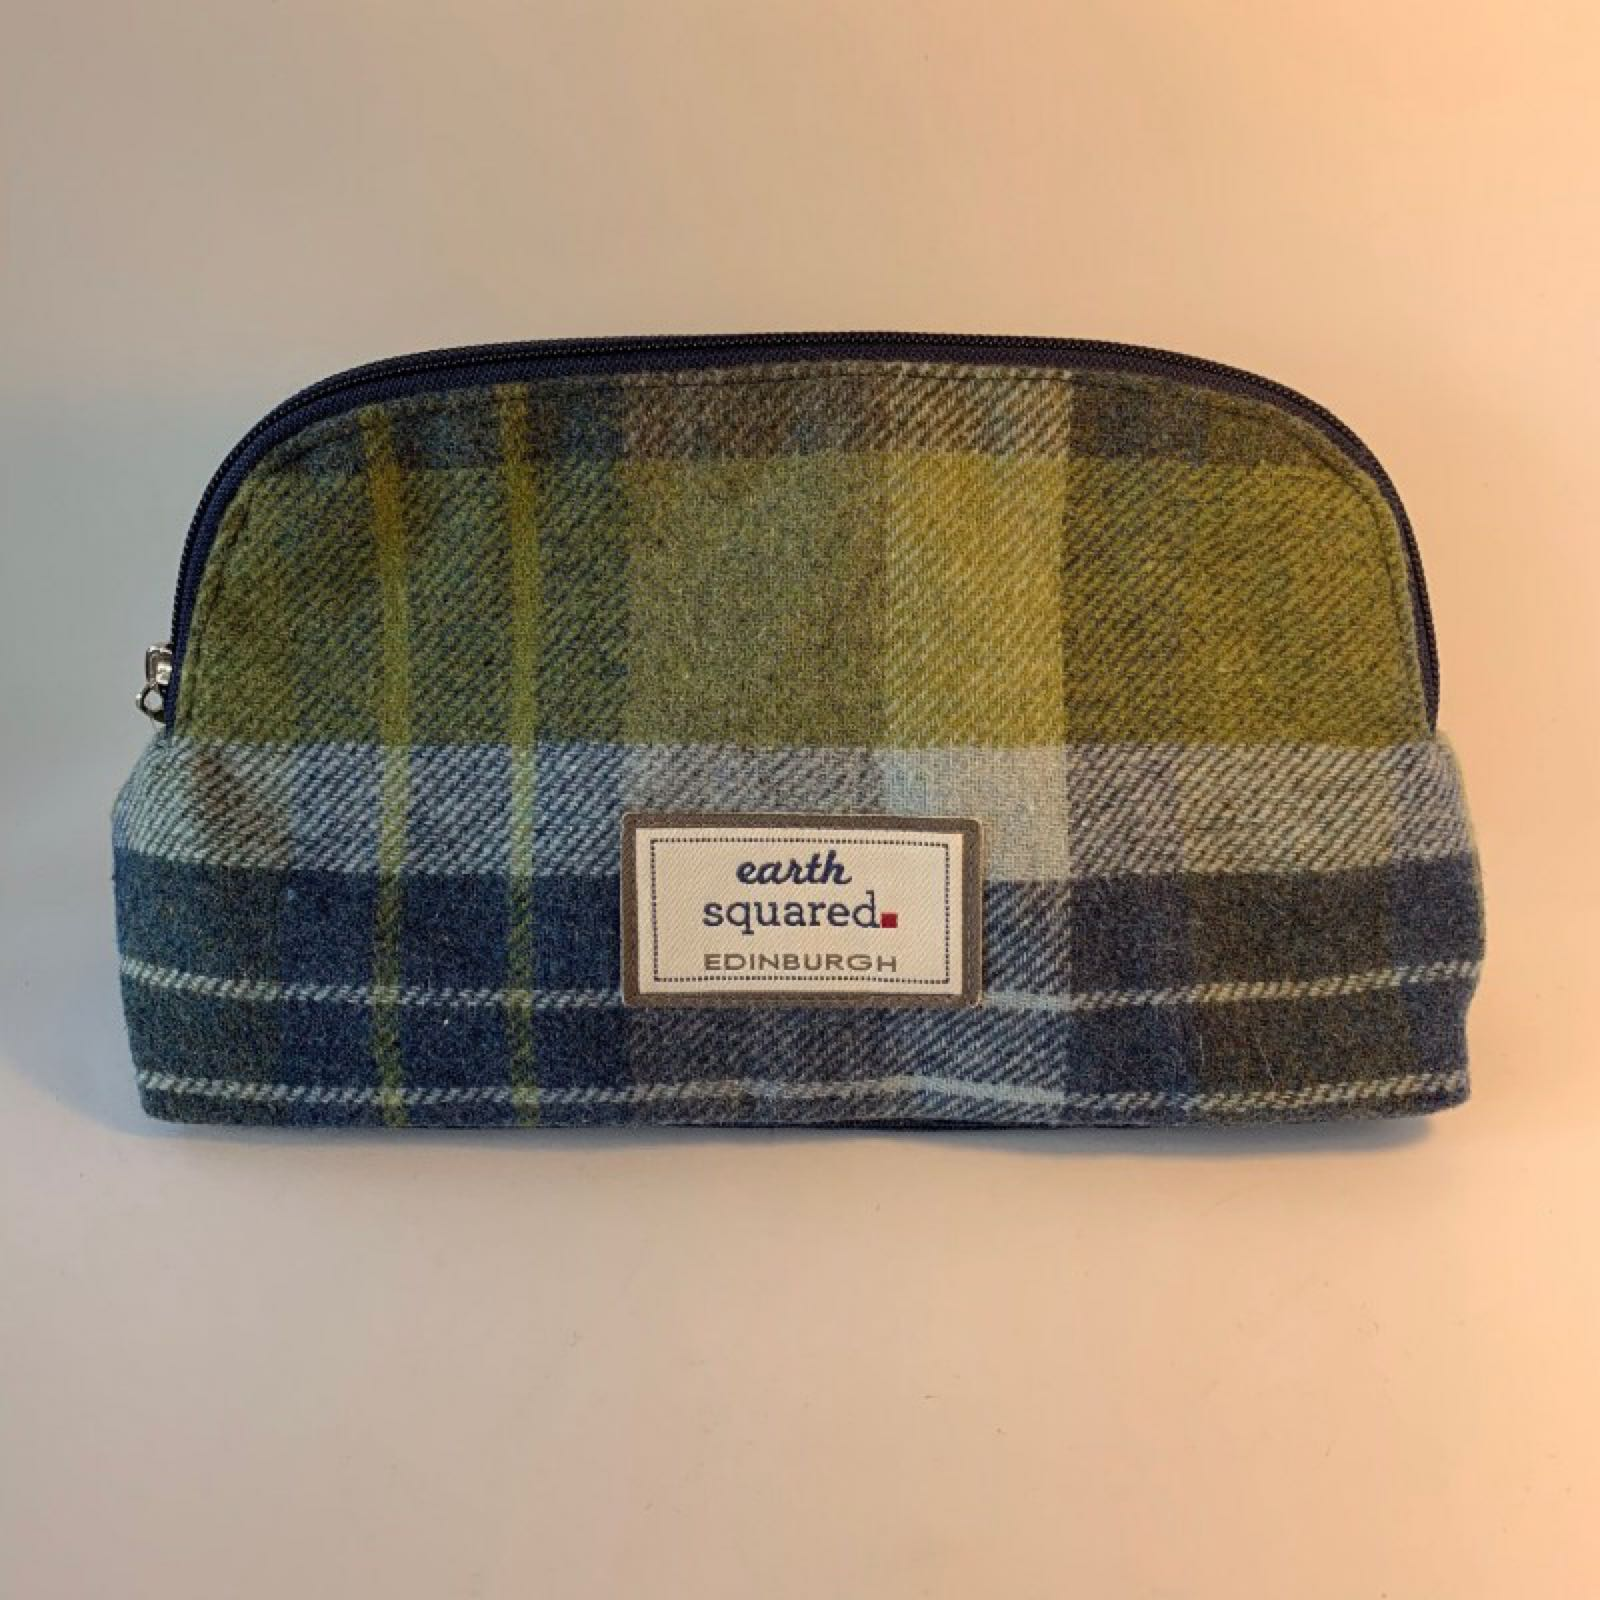 Earth Squared Toiletry Bag - Marina Blue Tweed